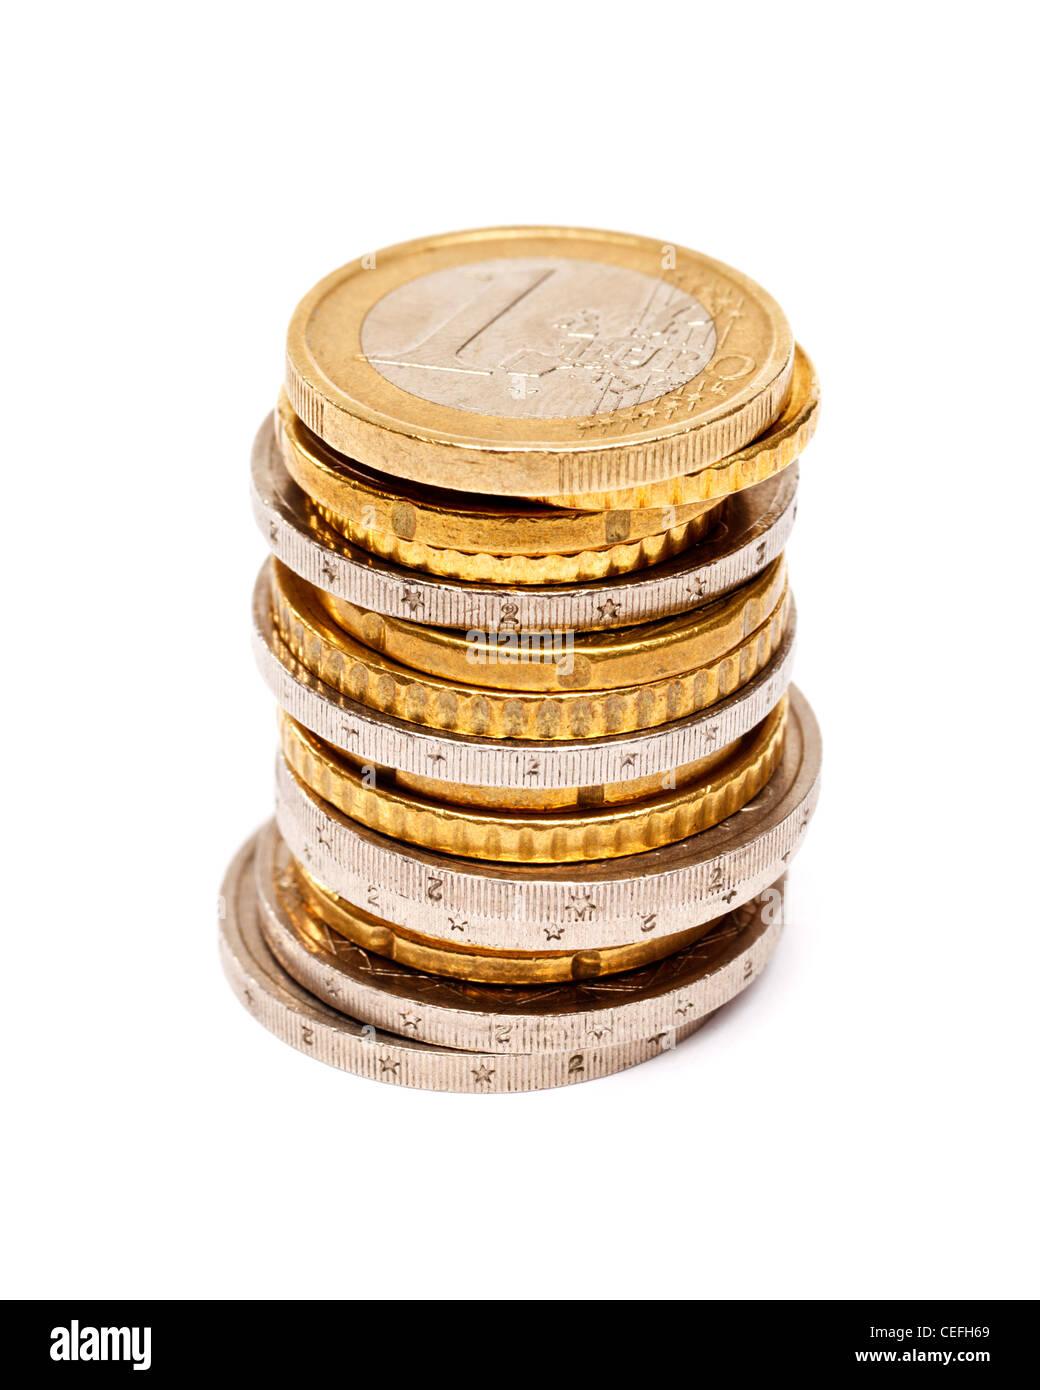 Euros coins stack on white background - Stock Image